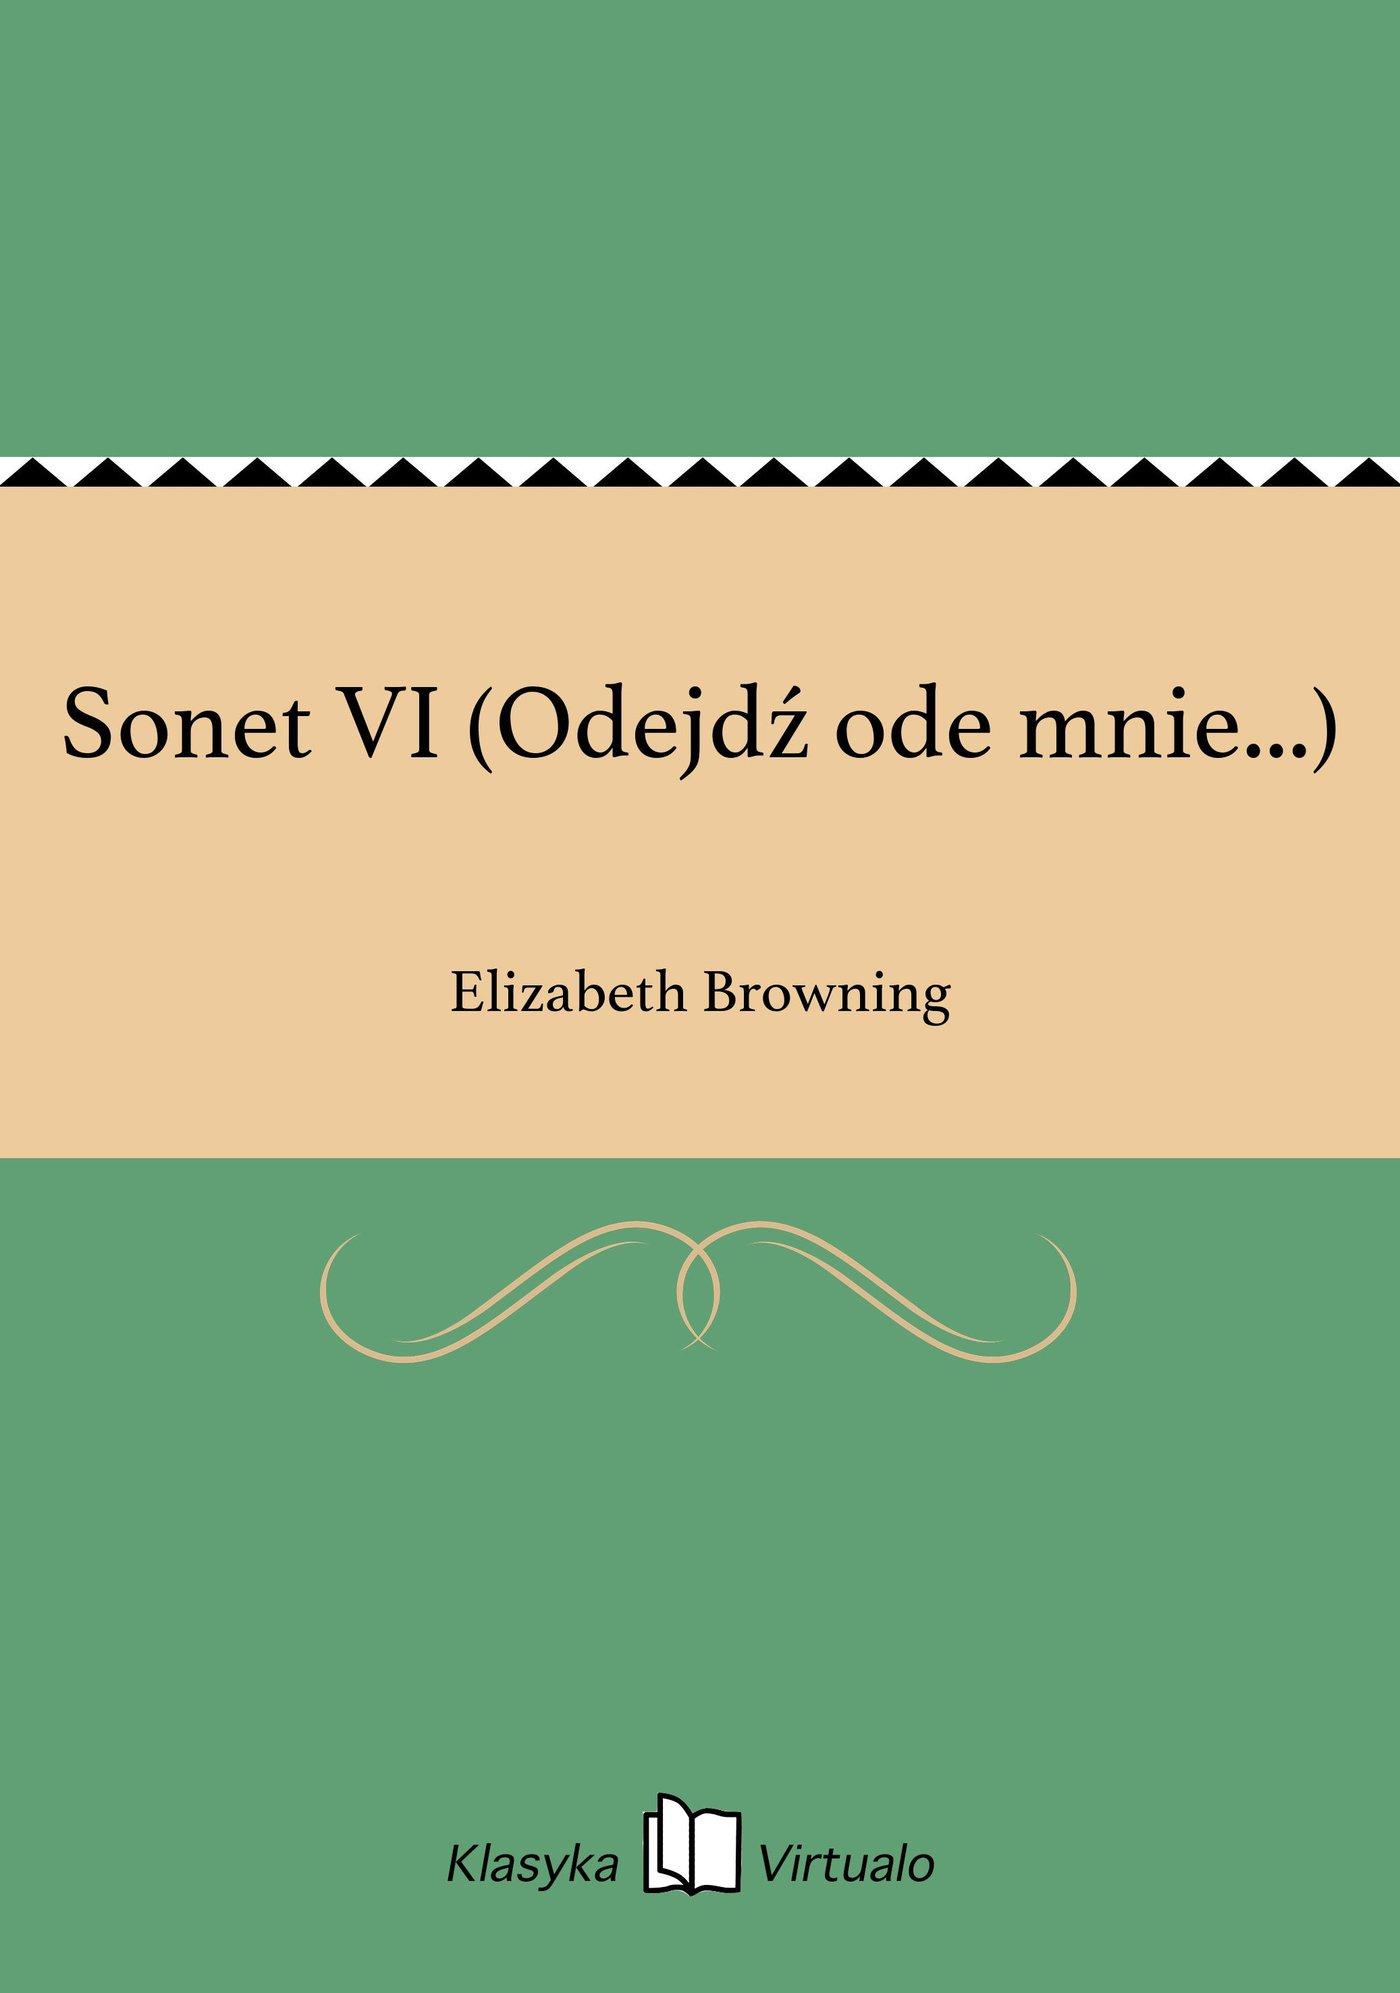 Sonet VI (Odejdź ode mnie...) - Ebook (Książka EPUB) do pobrania w formacie EPUB